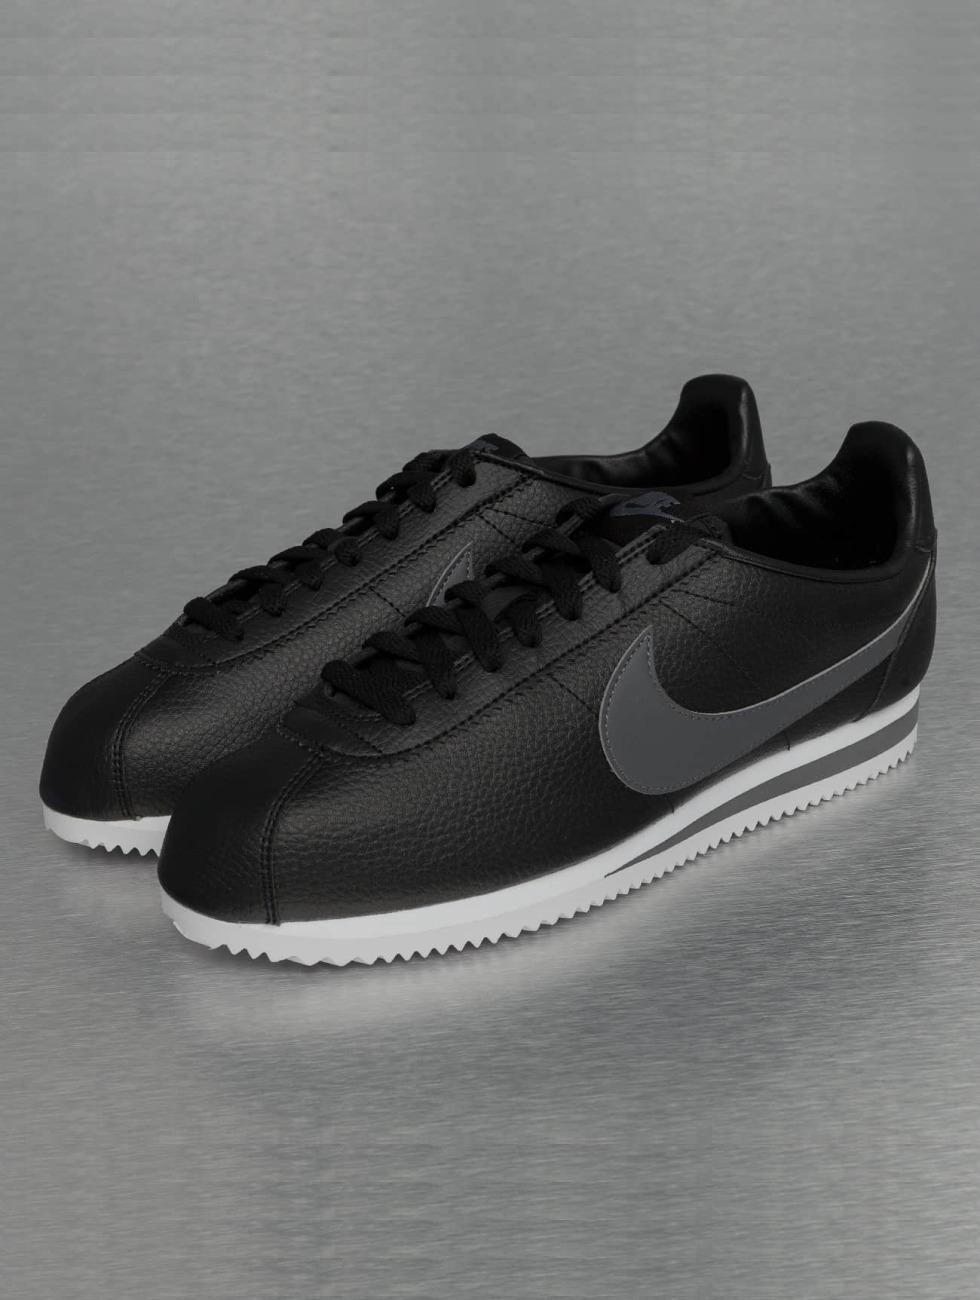 Nike Scarpa / Sneaker In Pelle Classica Cortez Nera 256986